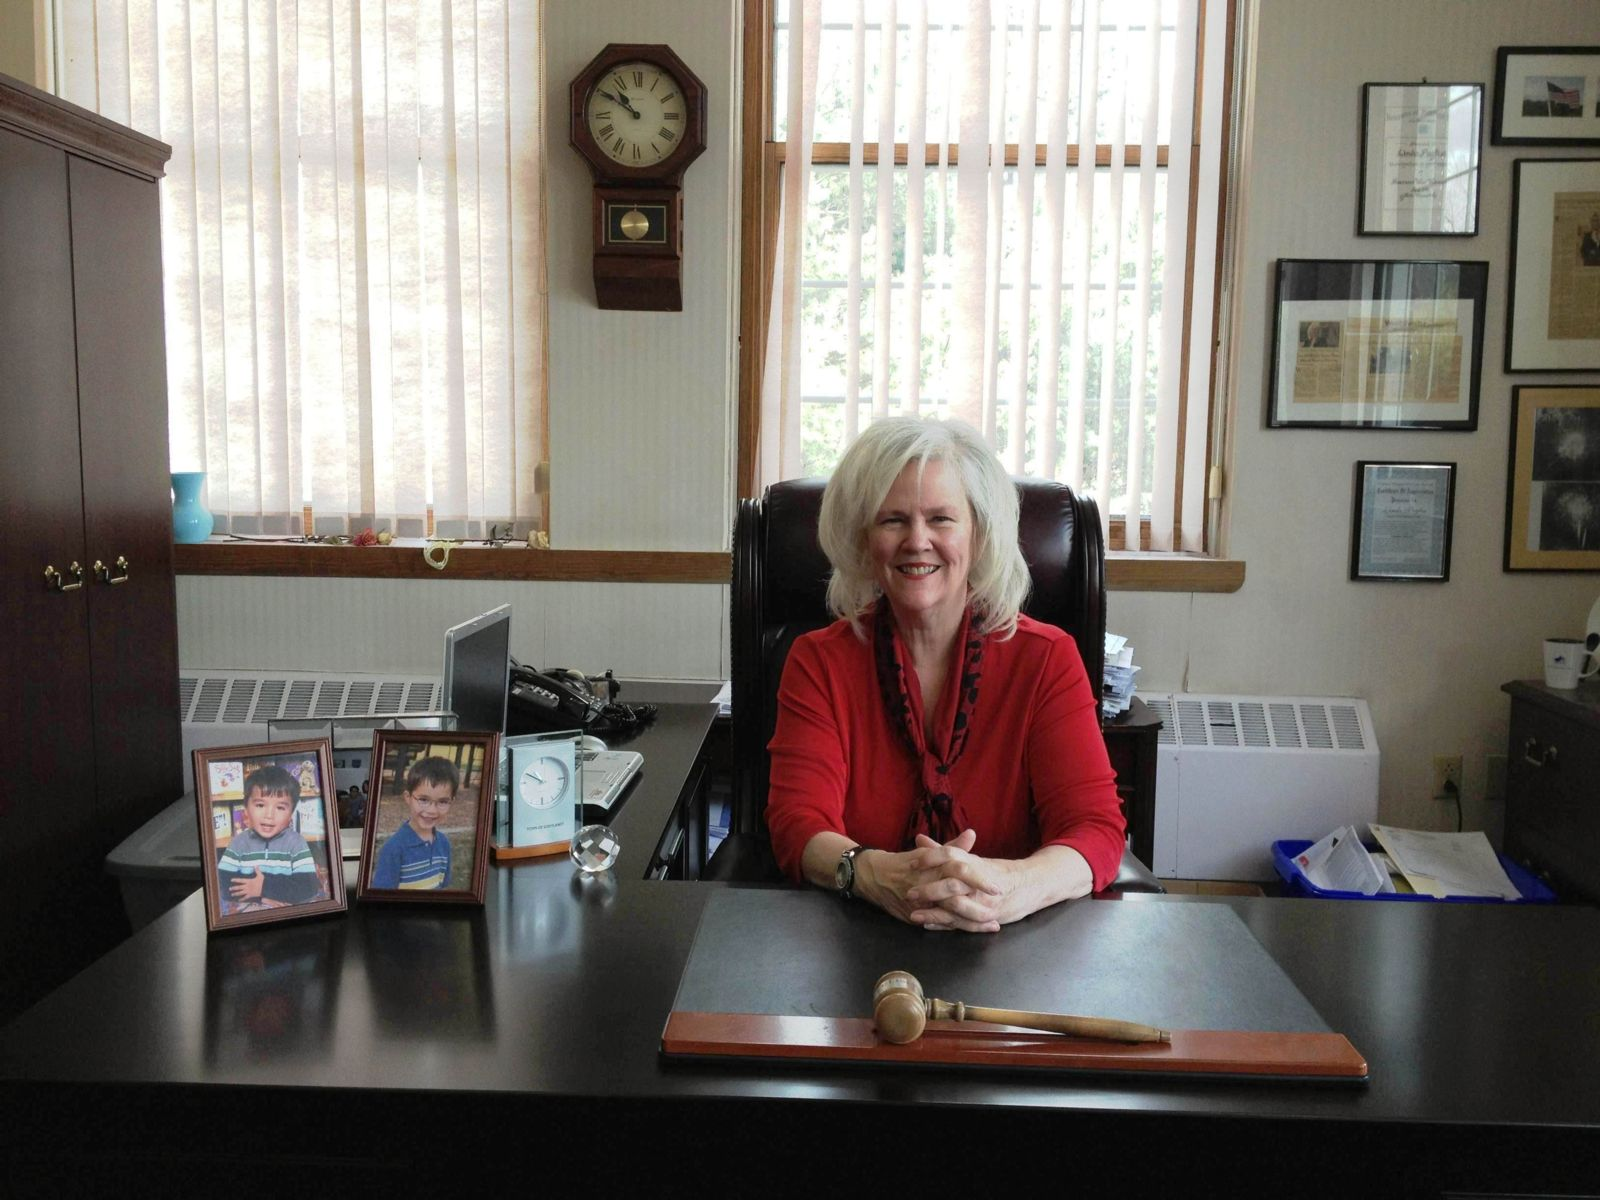 Town Supervisor, Linda Puglisi